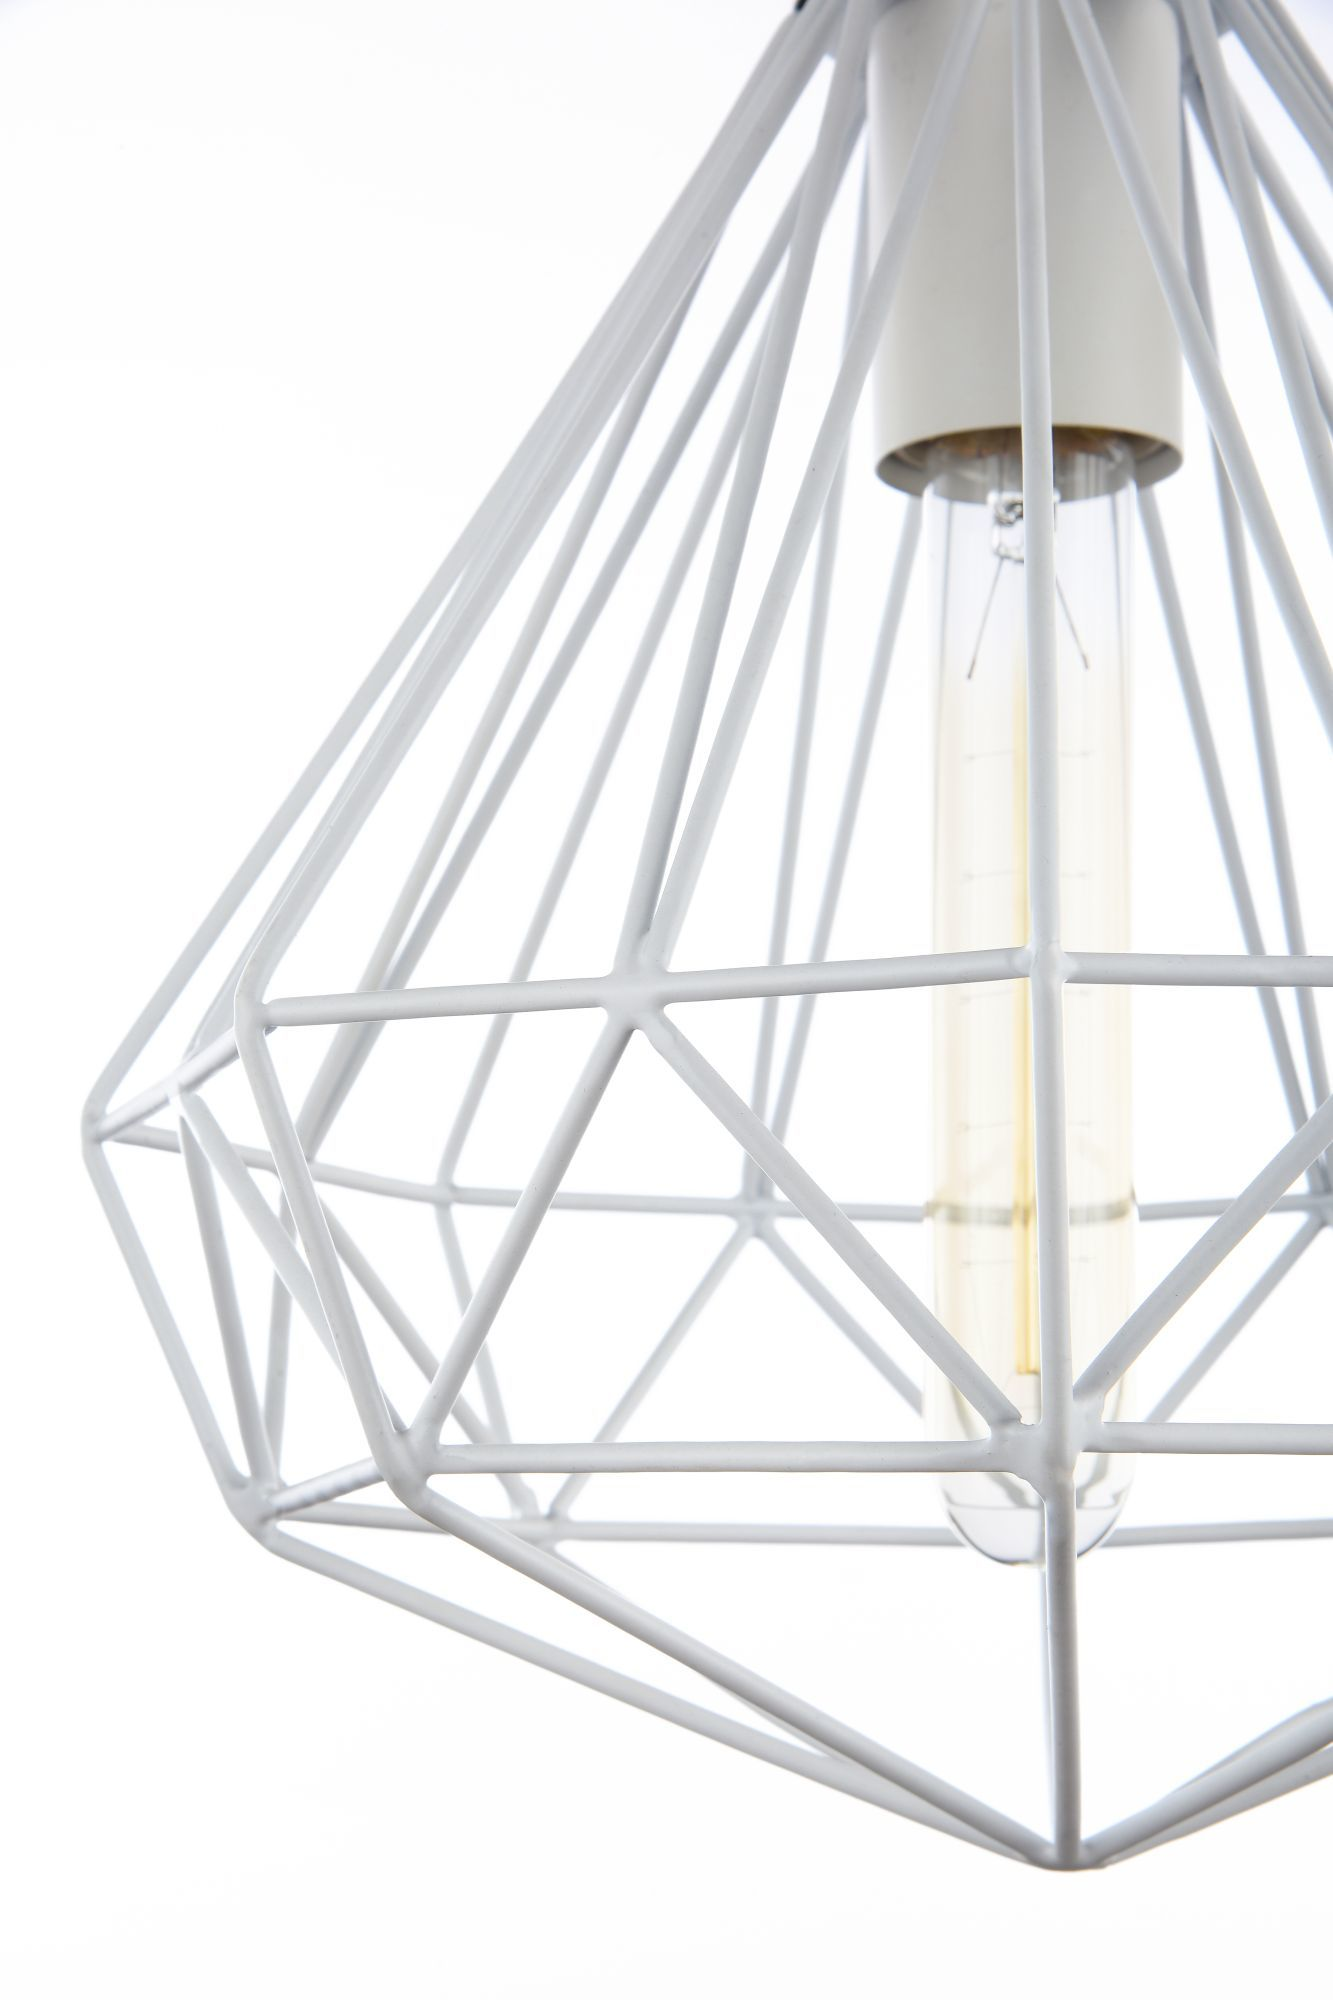 Подвесной светильник Maytoni Loft Calaf P360-PL-250-W (MOD360-01-W), 1xE27x60W, белый, металл - фото 7